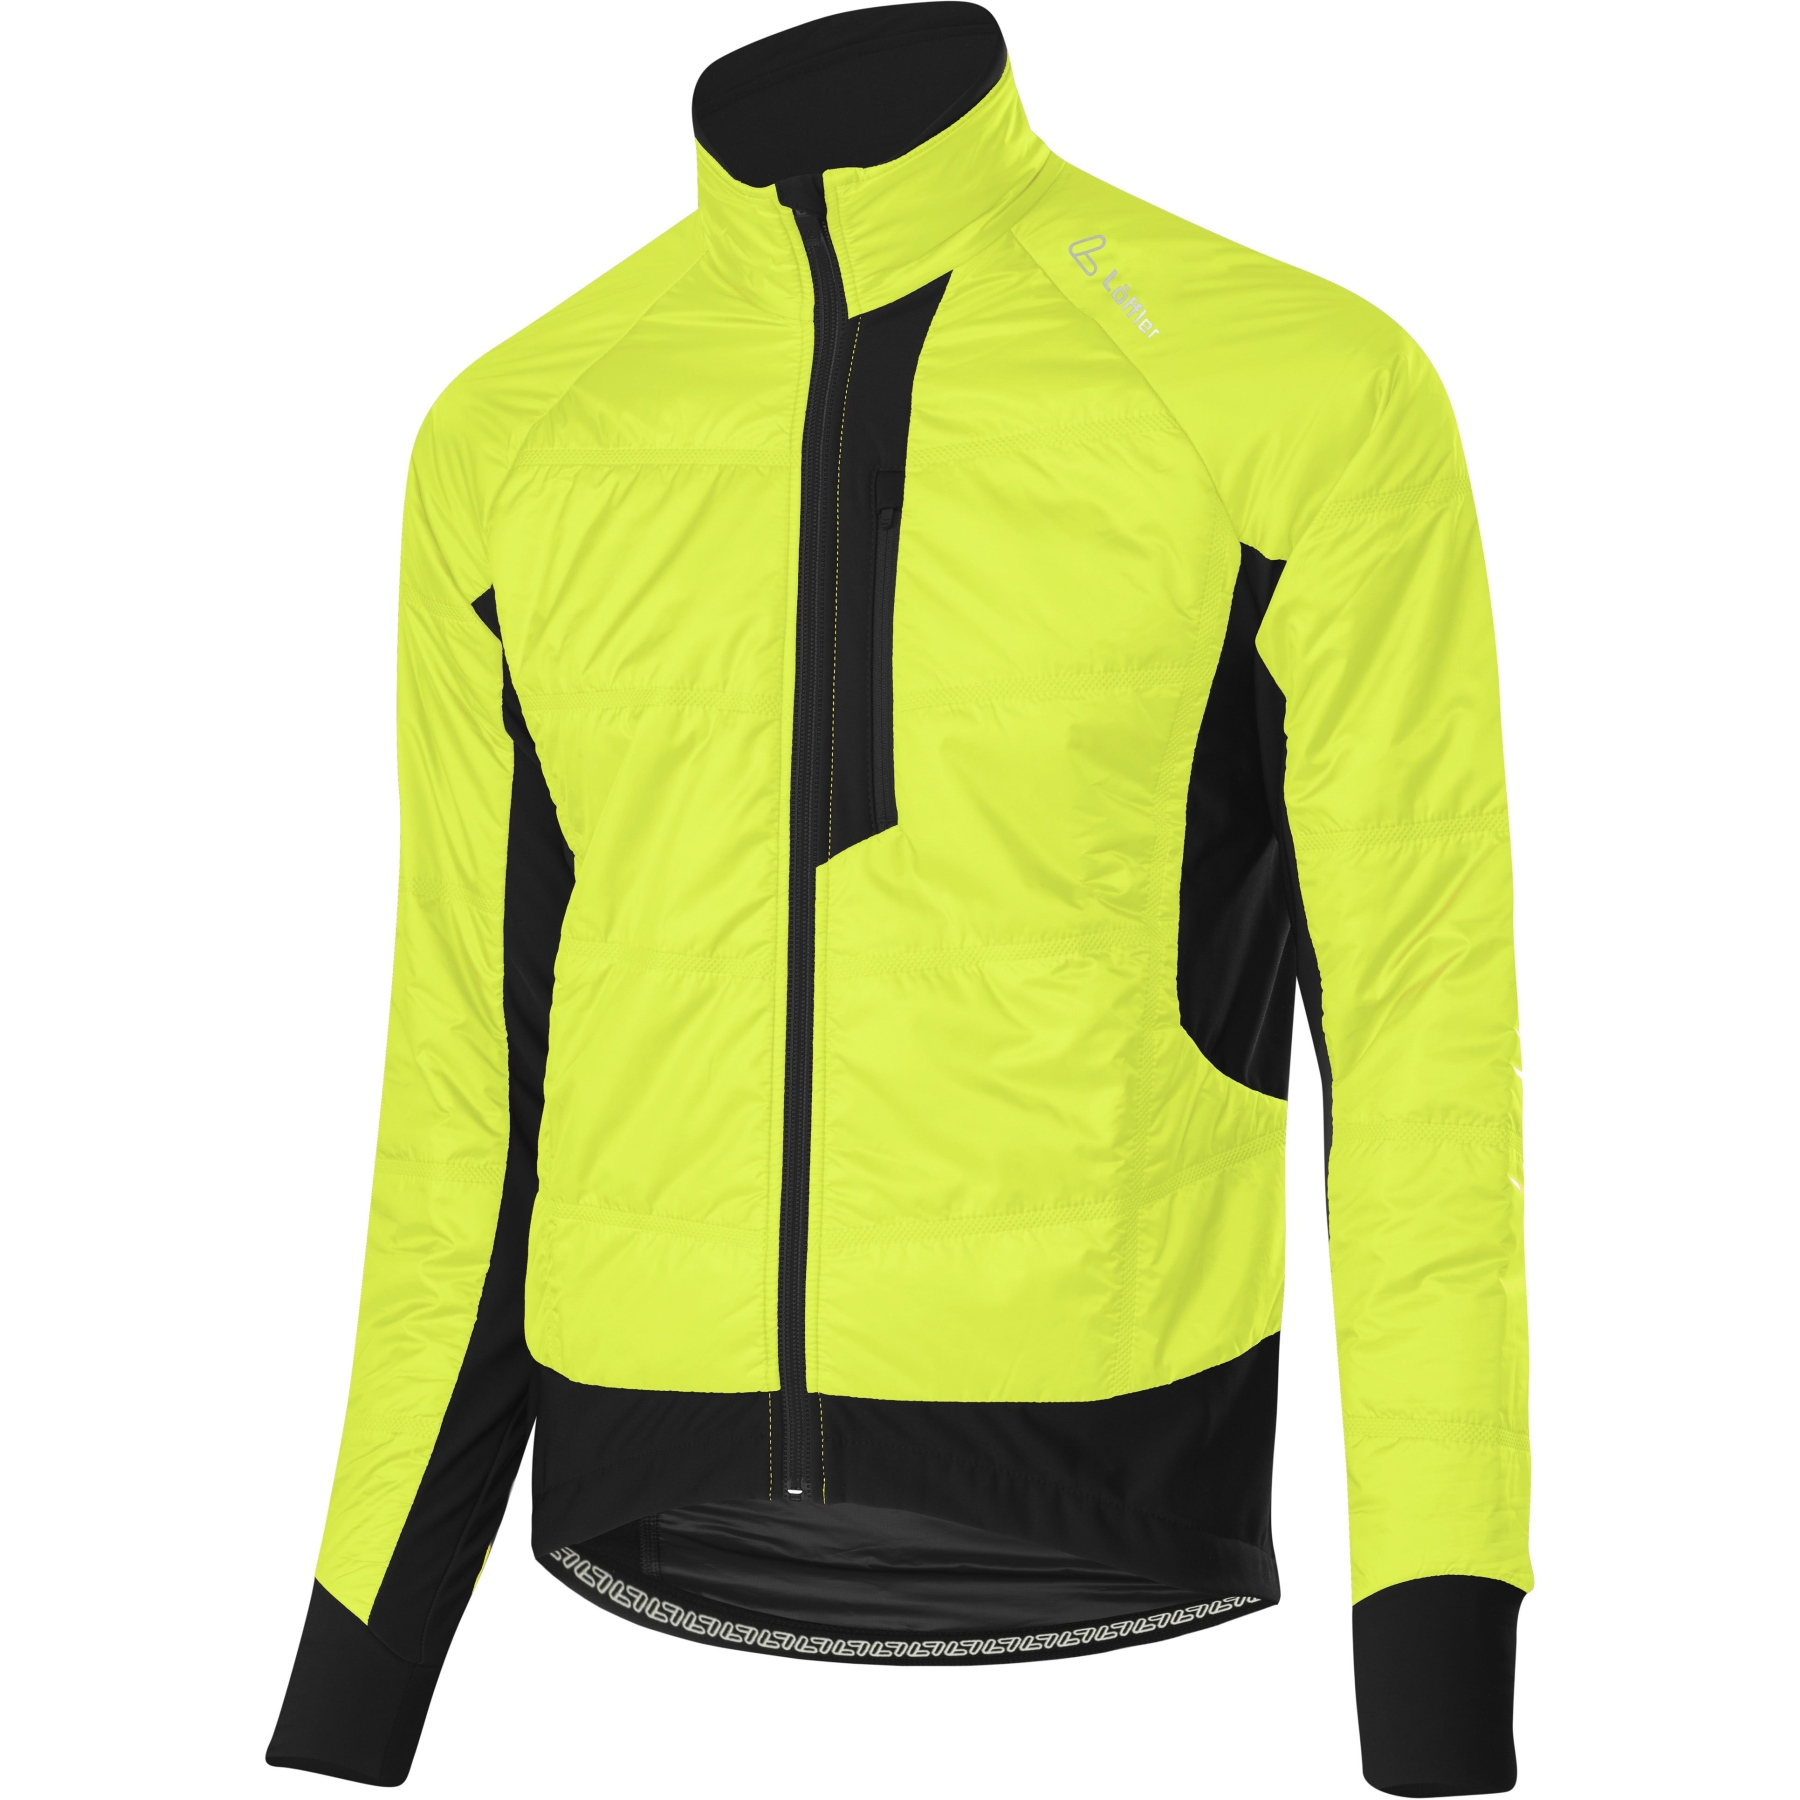 Löffler Bike Iso-Jacke Hotbond® PL60 20575 - neon gelb 200